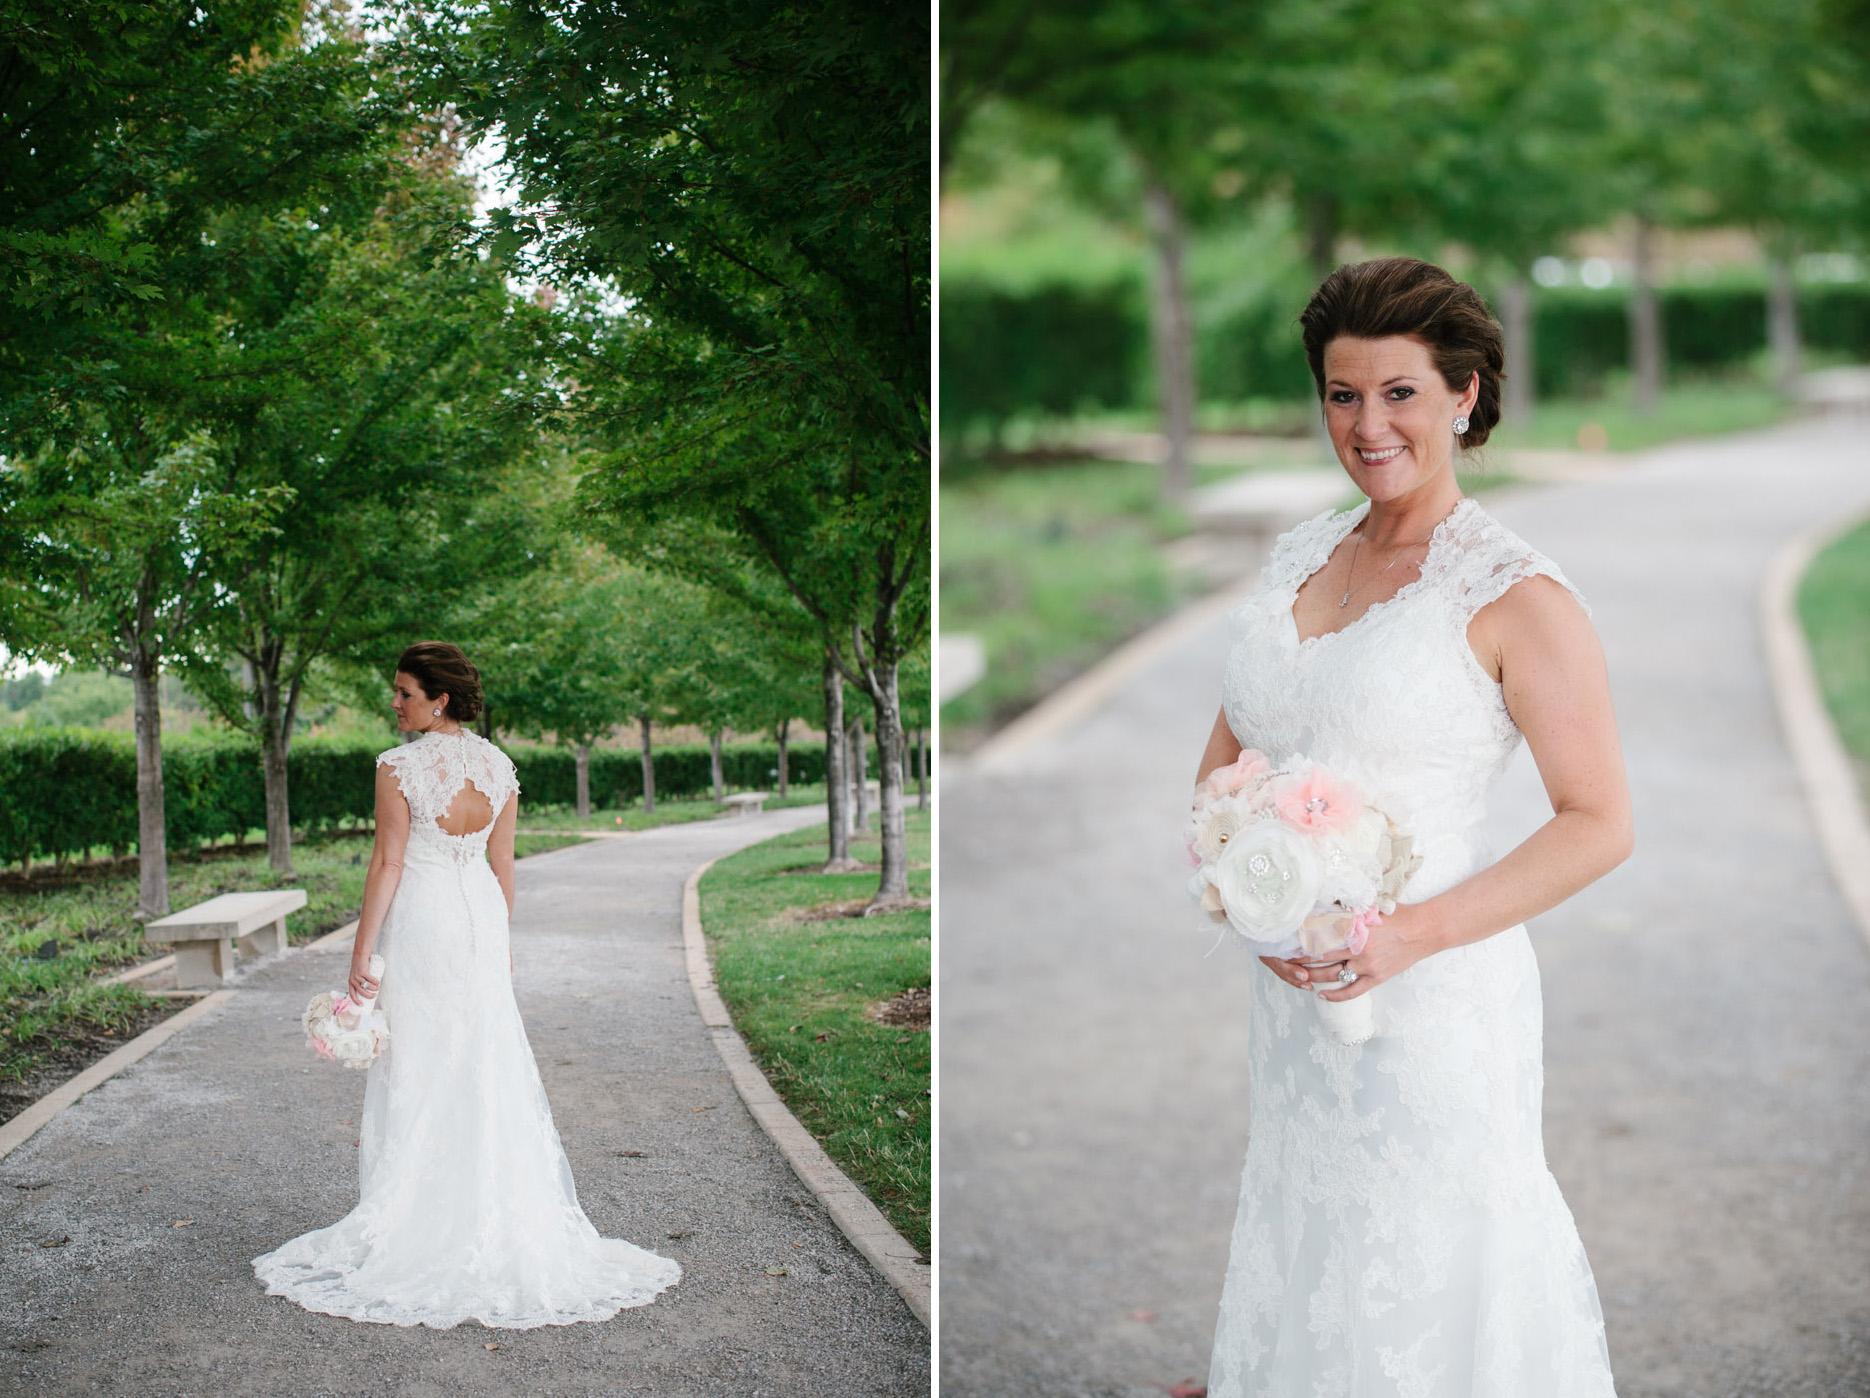 St-Louis-Wedding-Photography-1057-copy.jpg